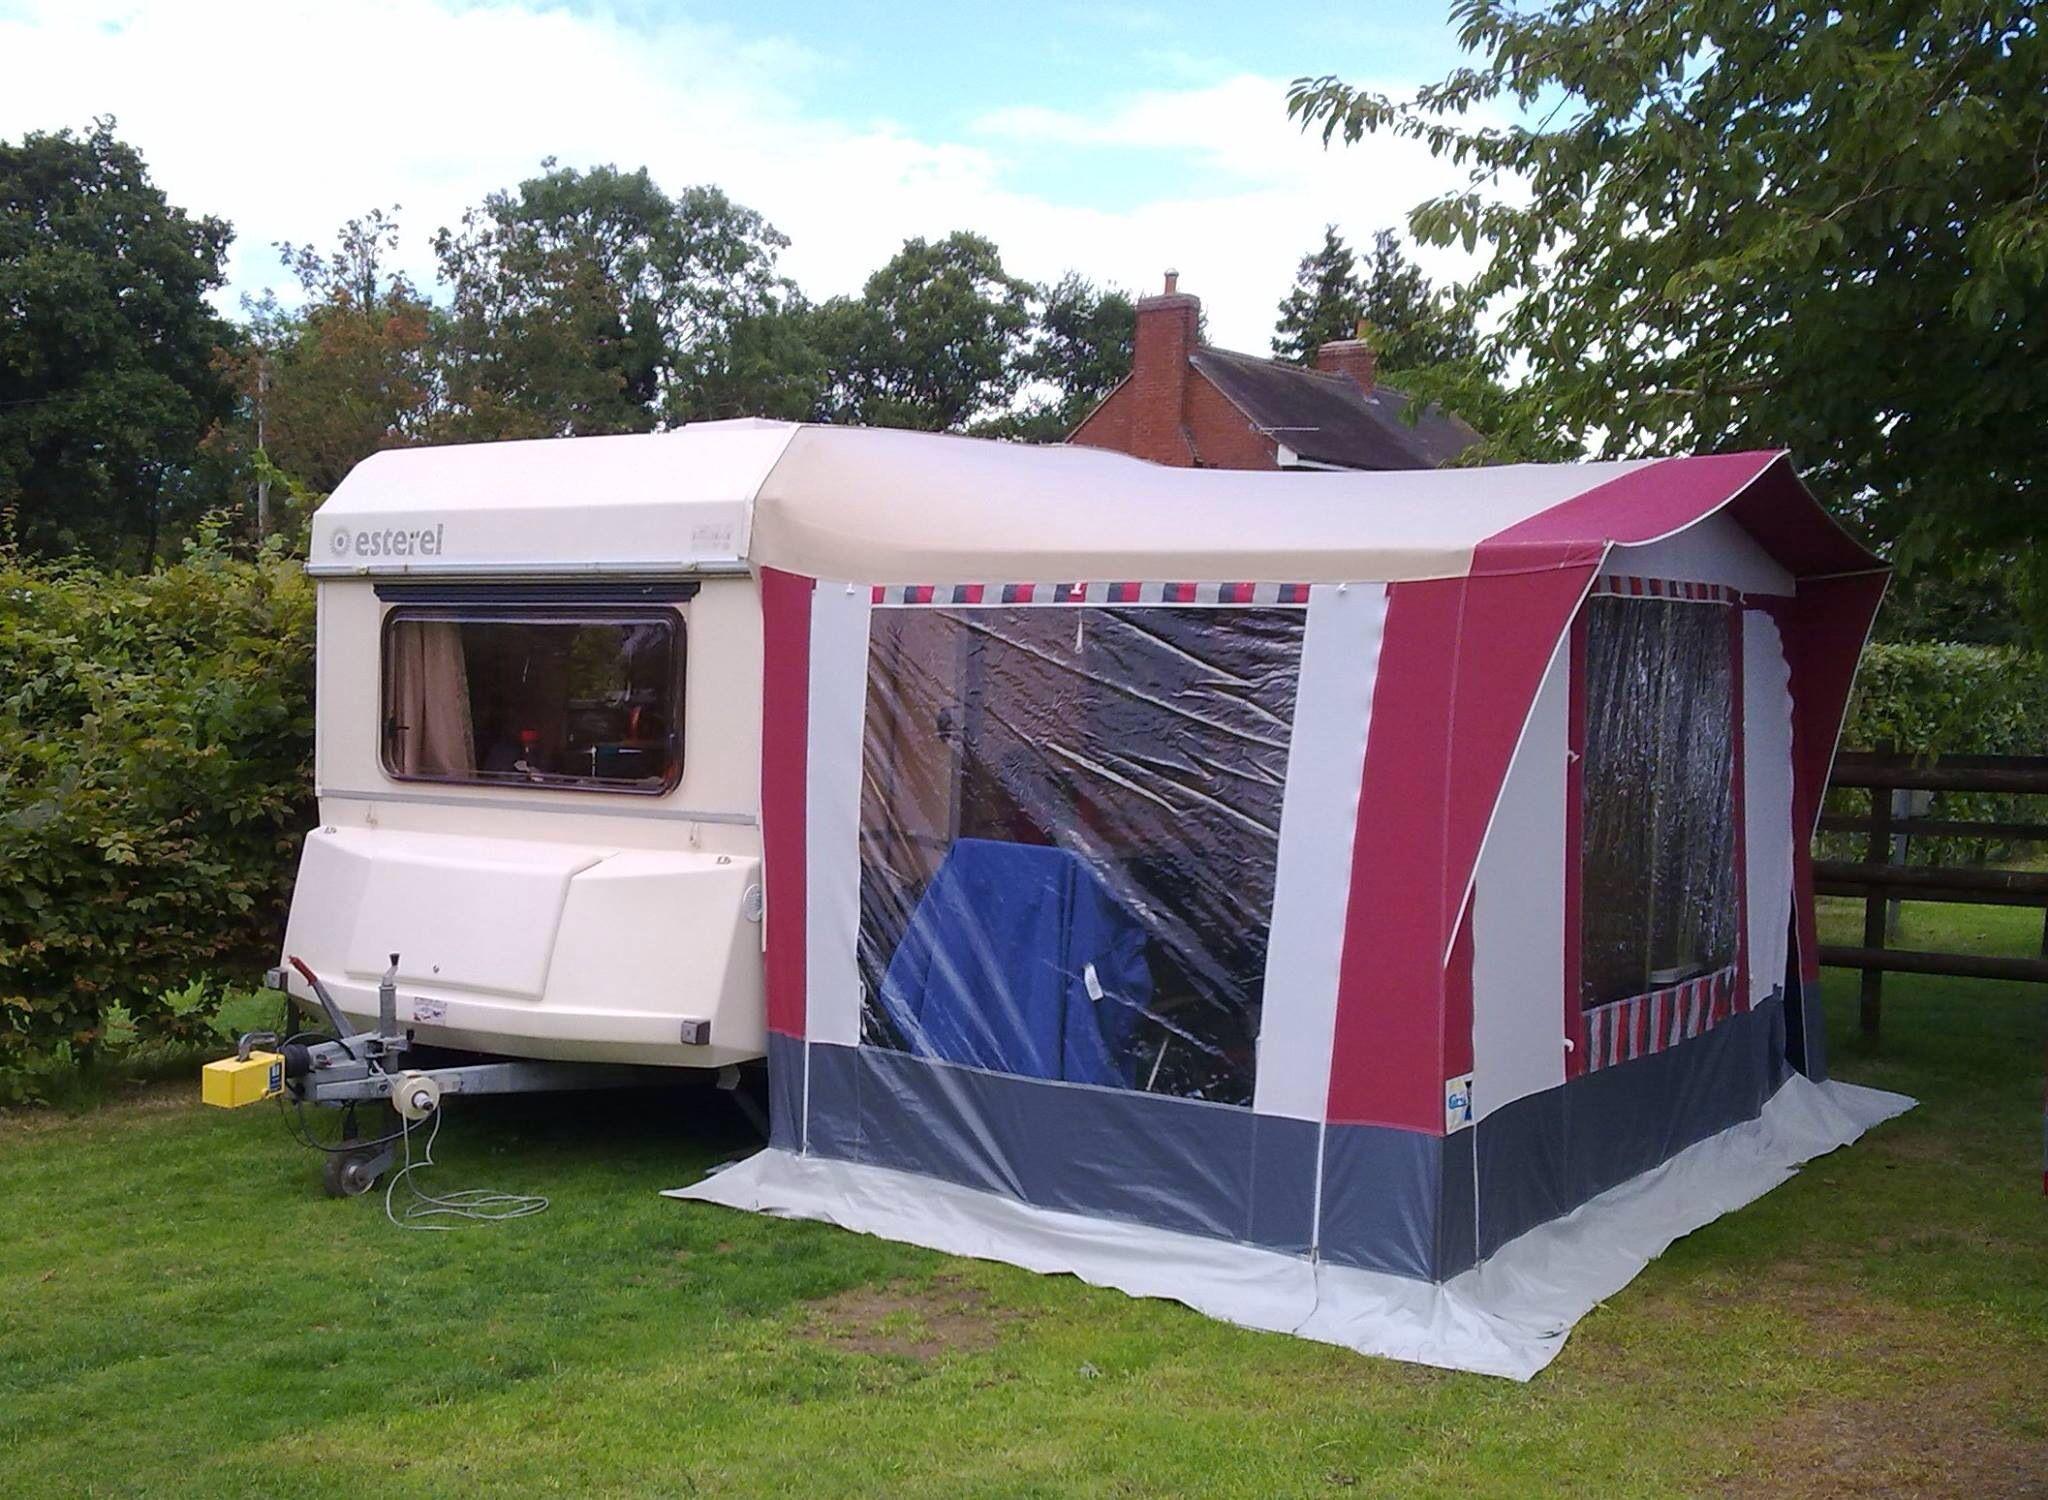 Esterel Top Volume 3 Berth With Awning Vintage Camper Camper Caravan Recreational Vehicles